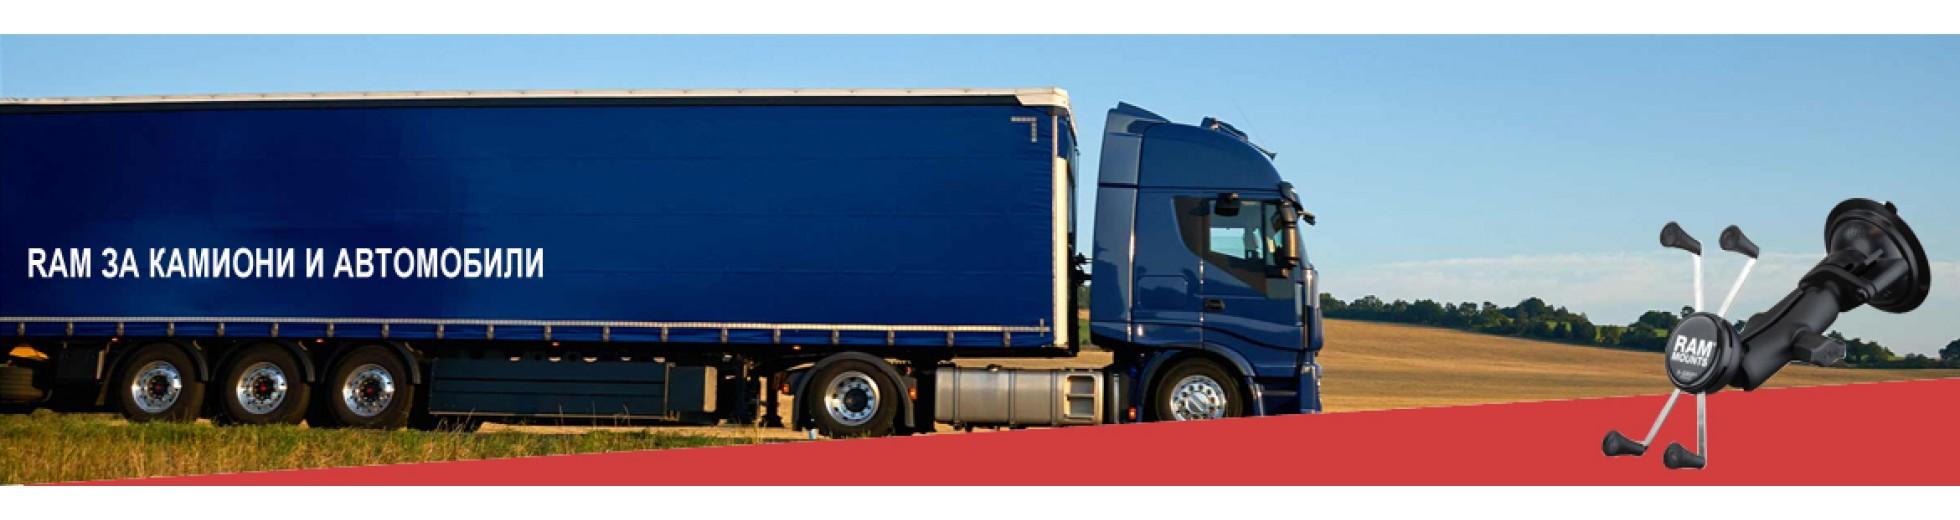 RAM за камиони и автомобили